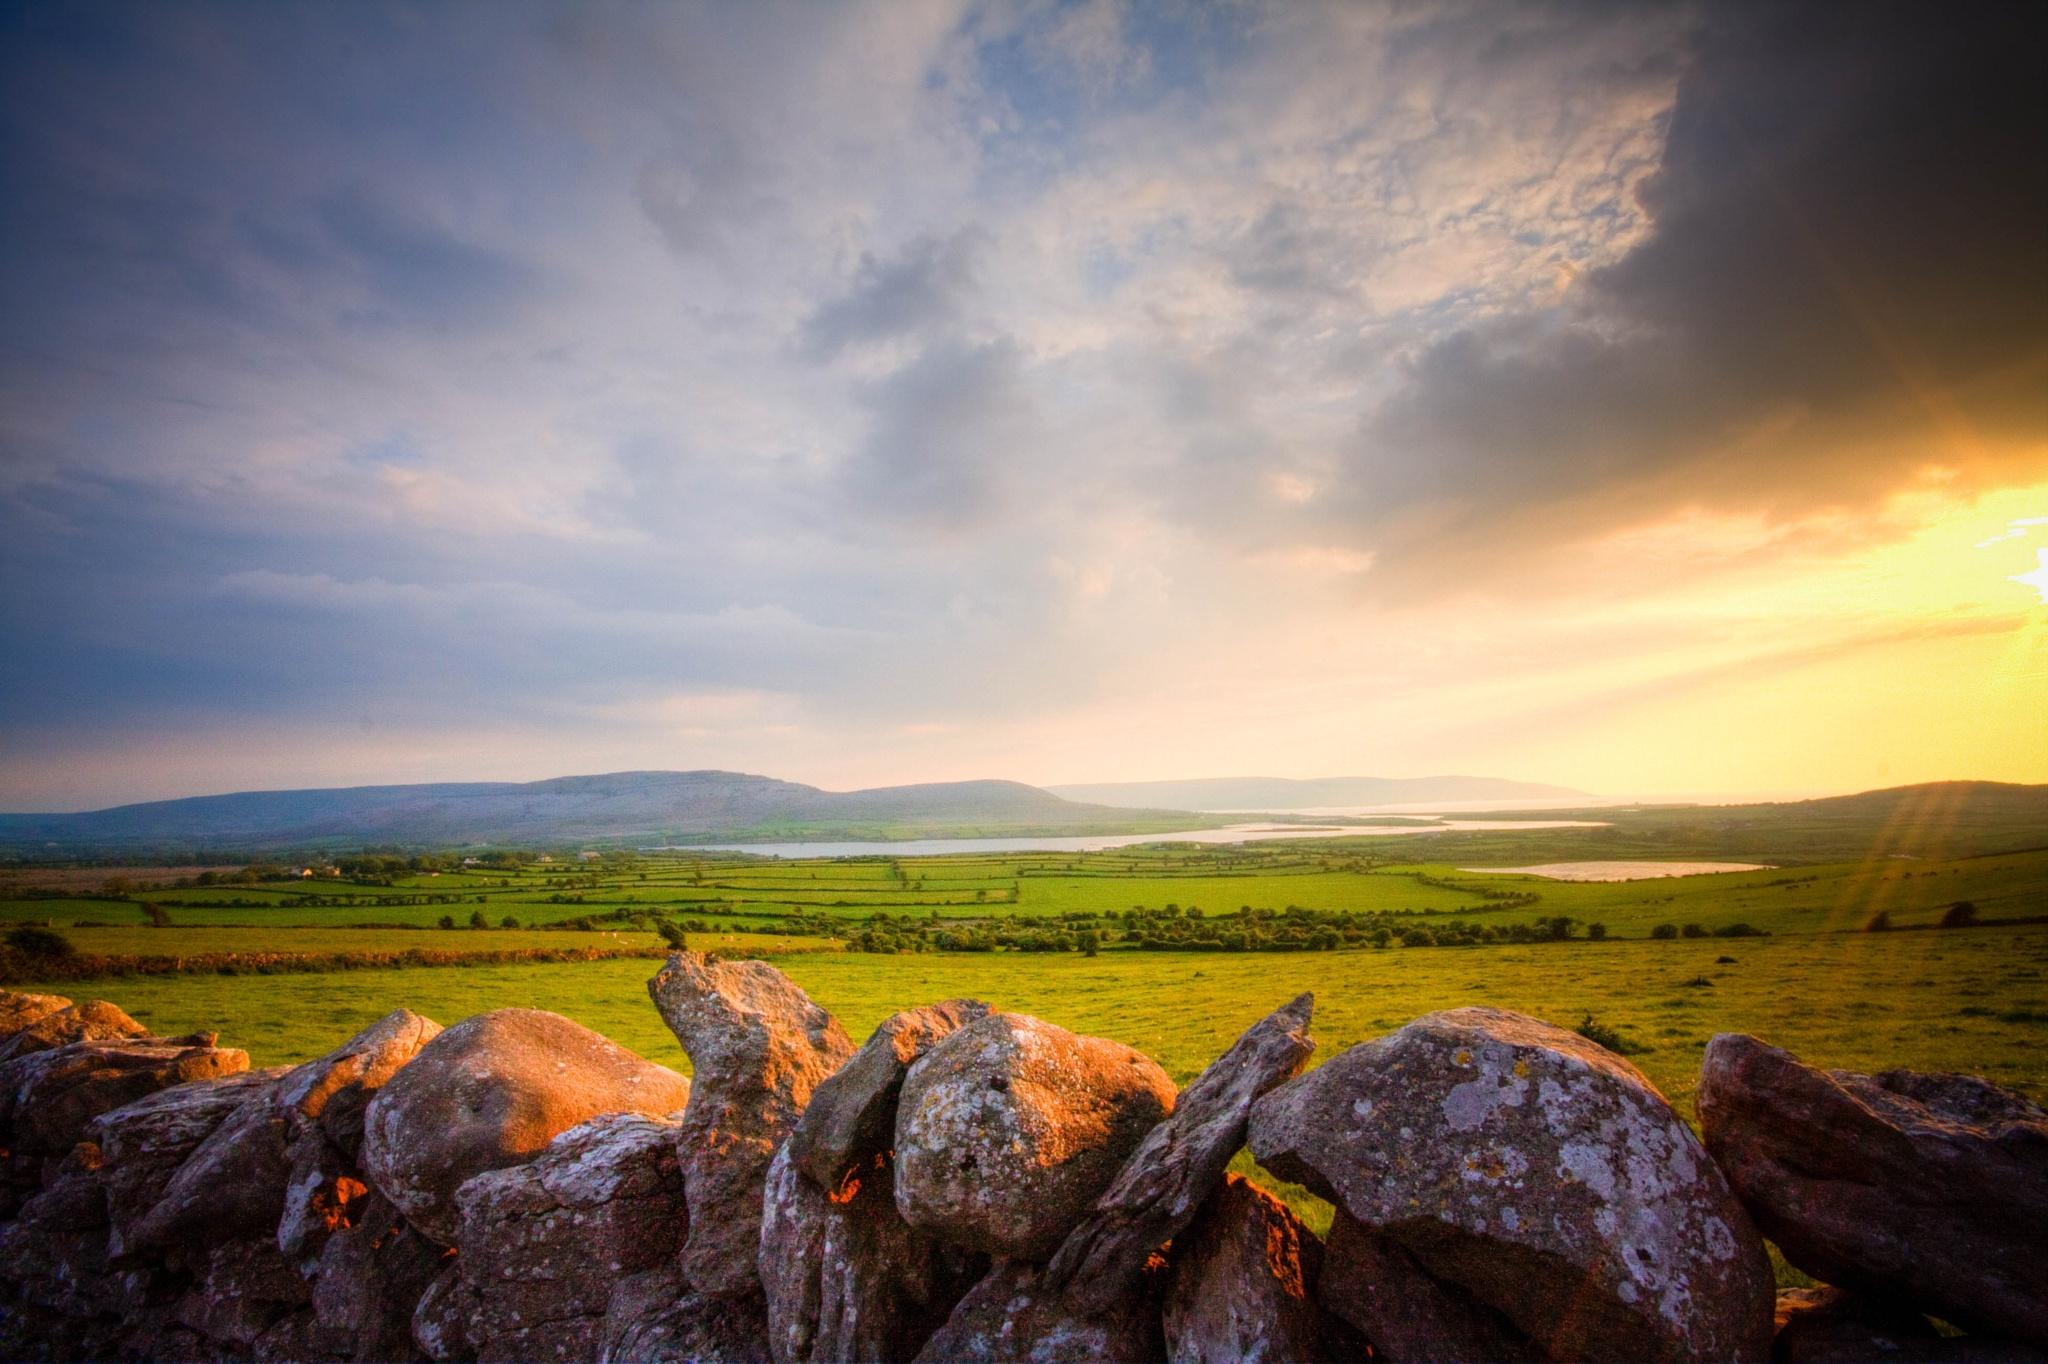 Warm Stones by John Morgan